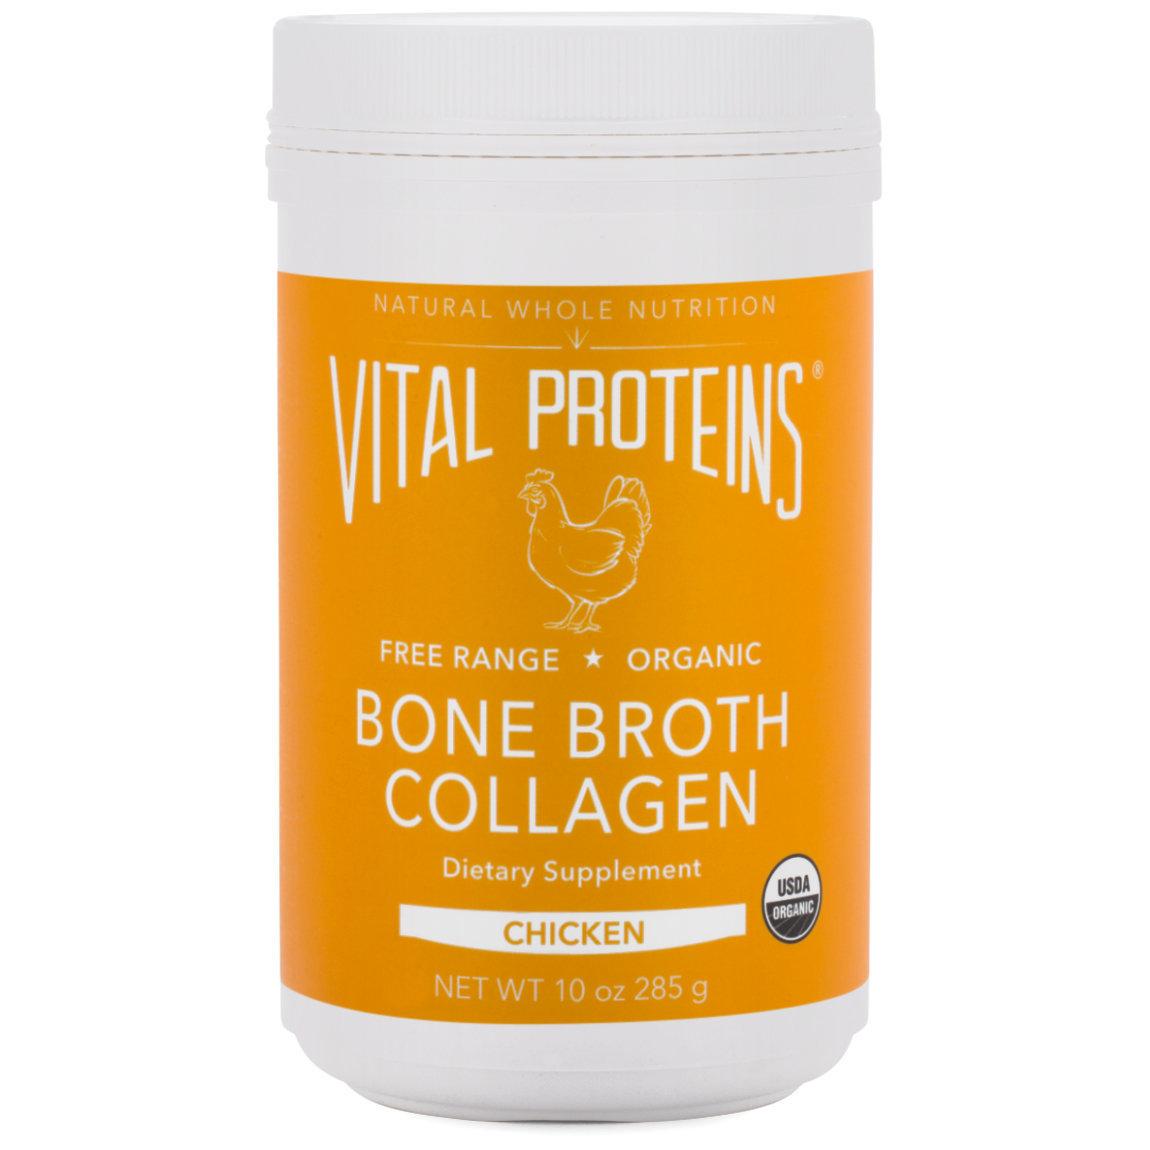 Vital Proteins Bone Broth Collagen - Unflavored Chicken 10 oz product swatch.